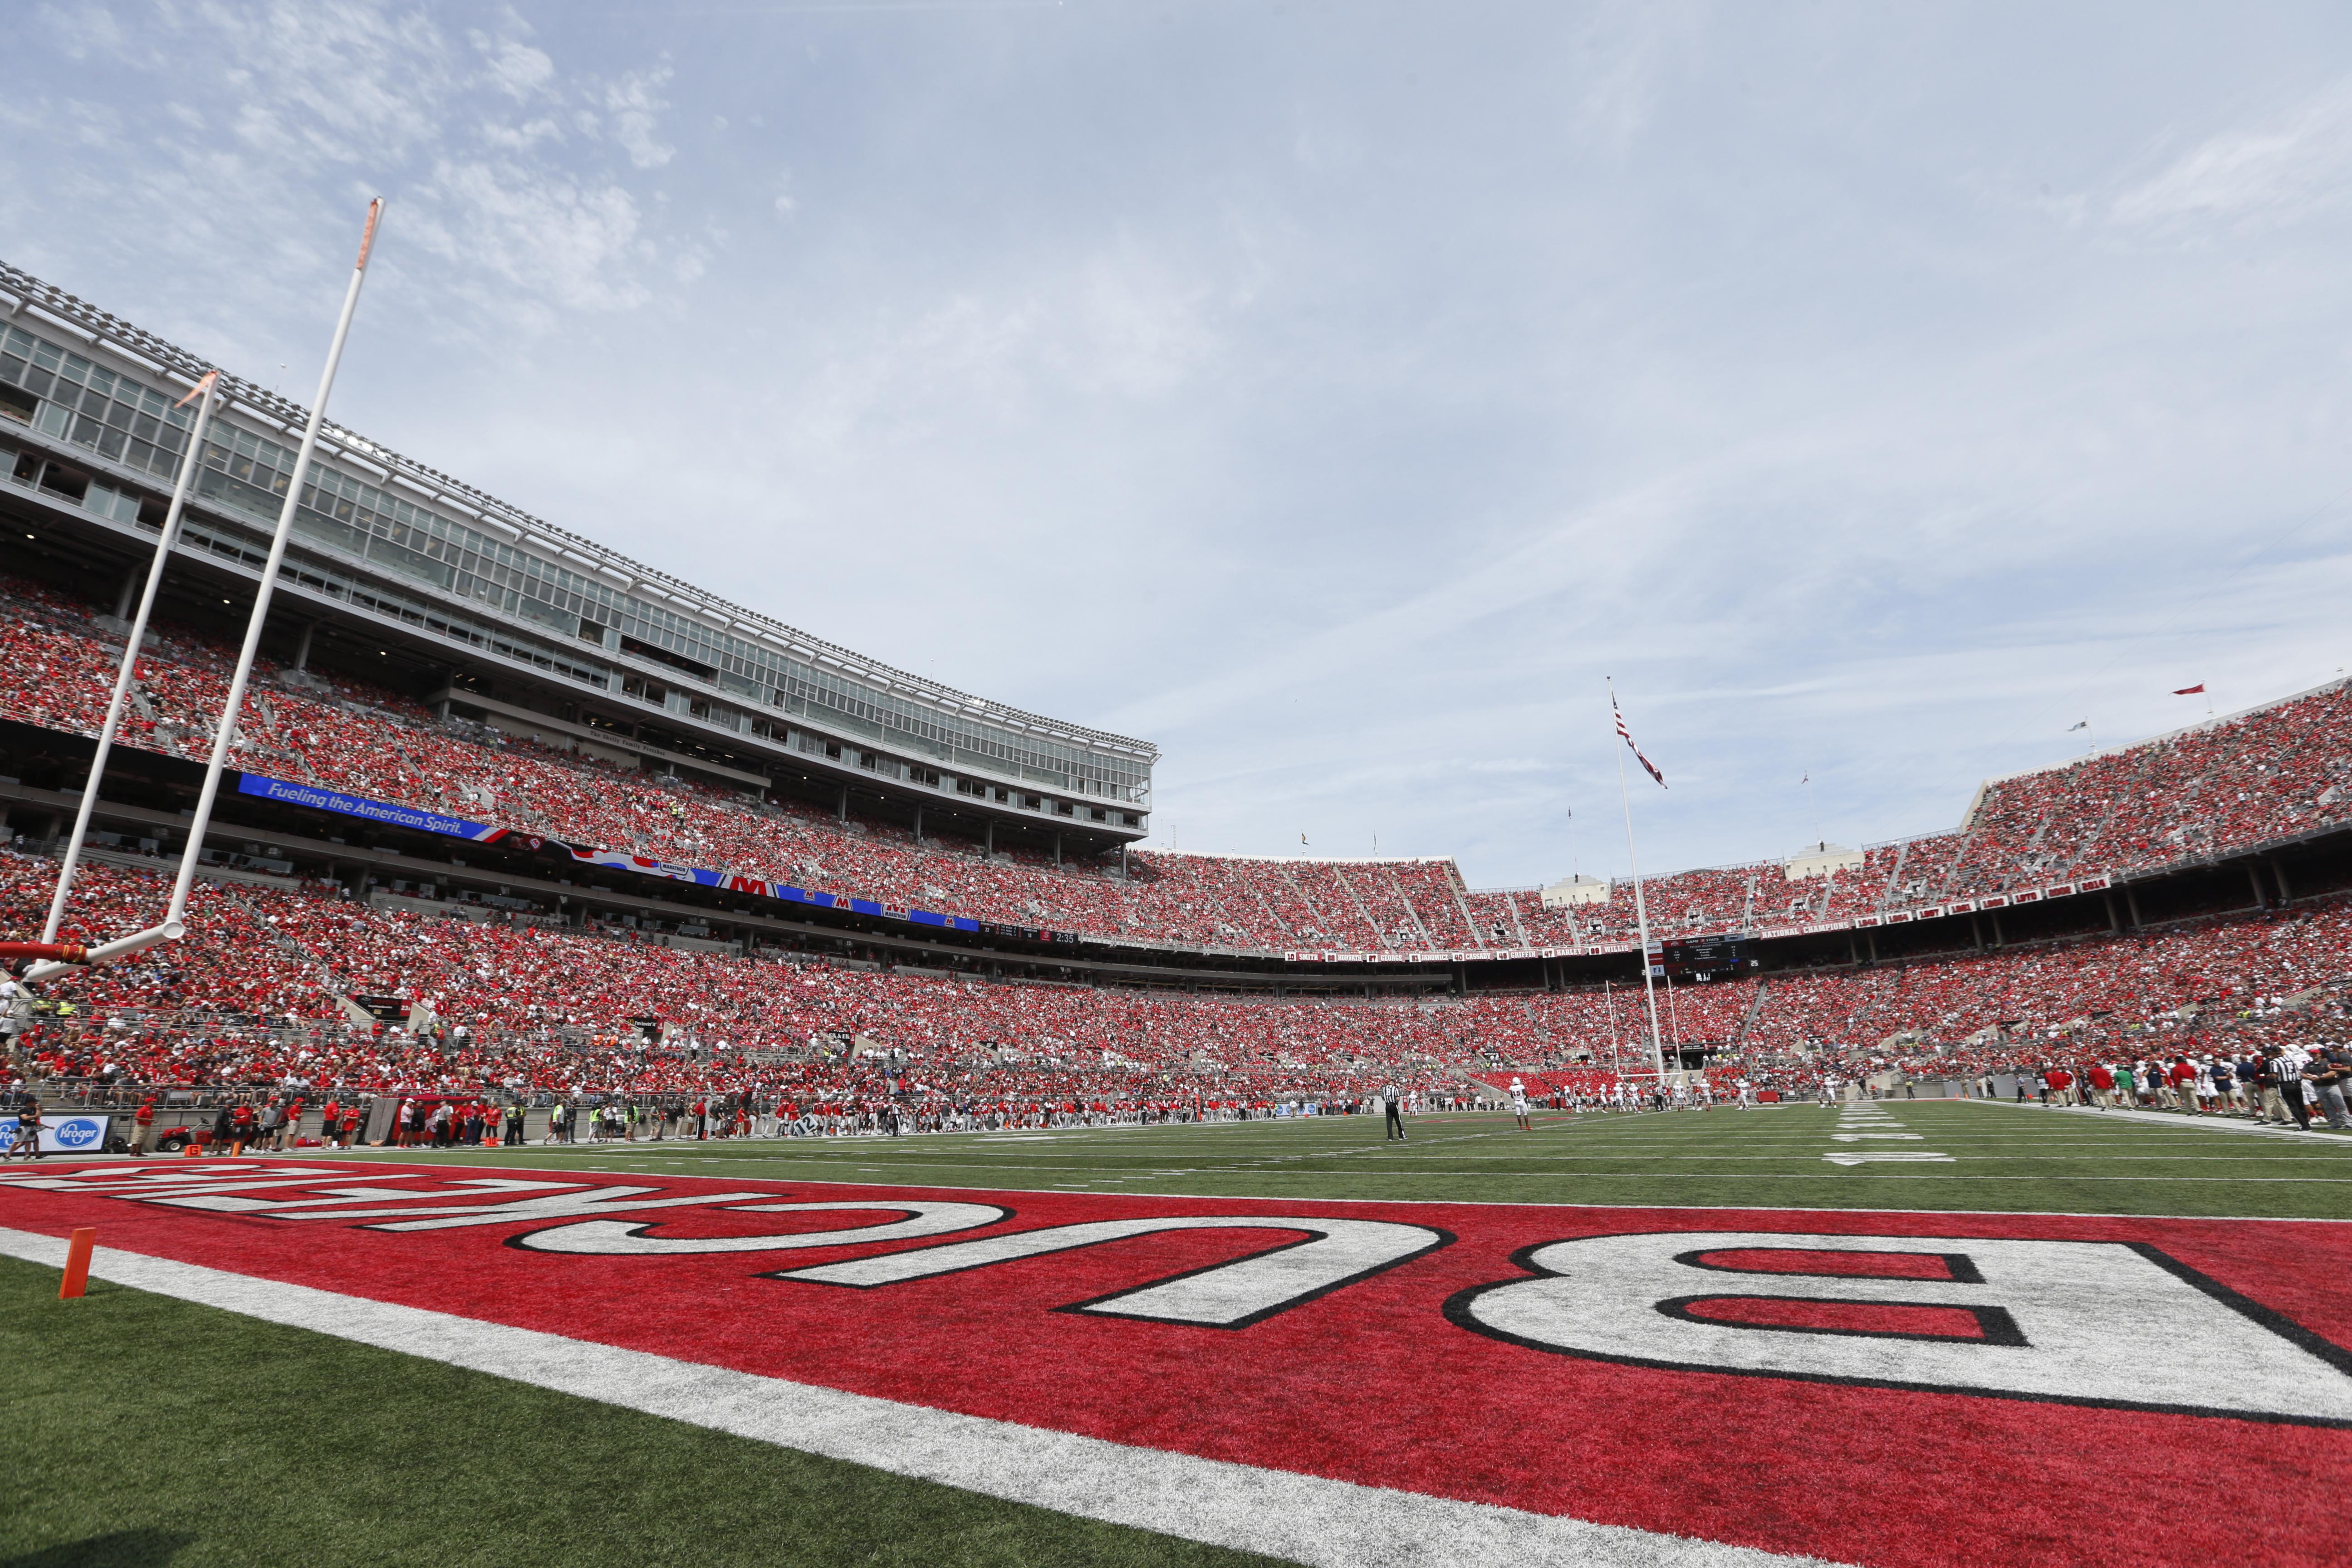 Ohio State Academic Calendar 2022 2023.Ohio State Football Future Schedules 2021 2022 2023 2024 2025 Cleveland Com